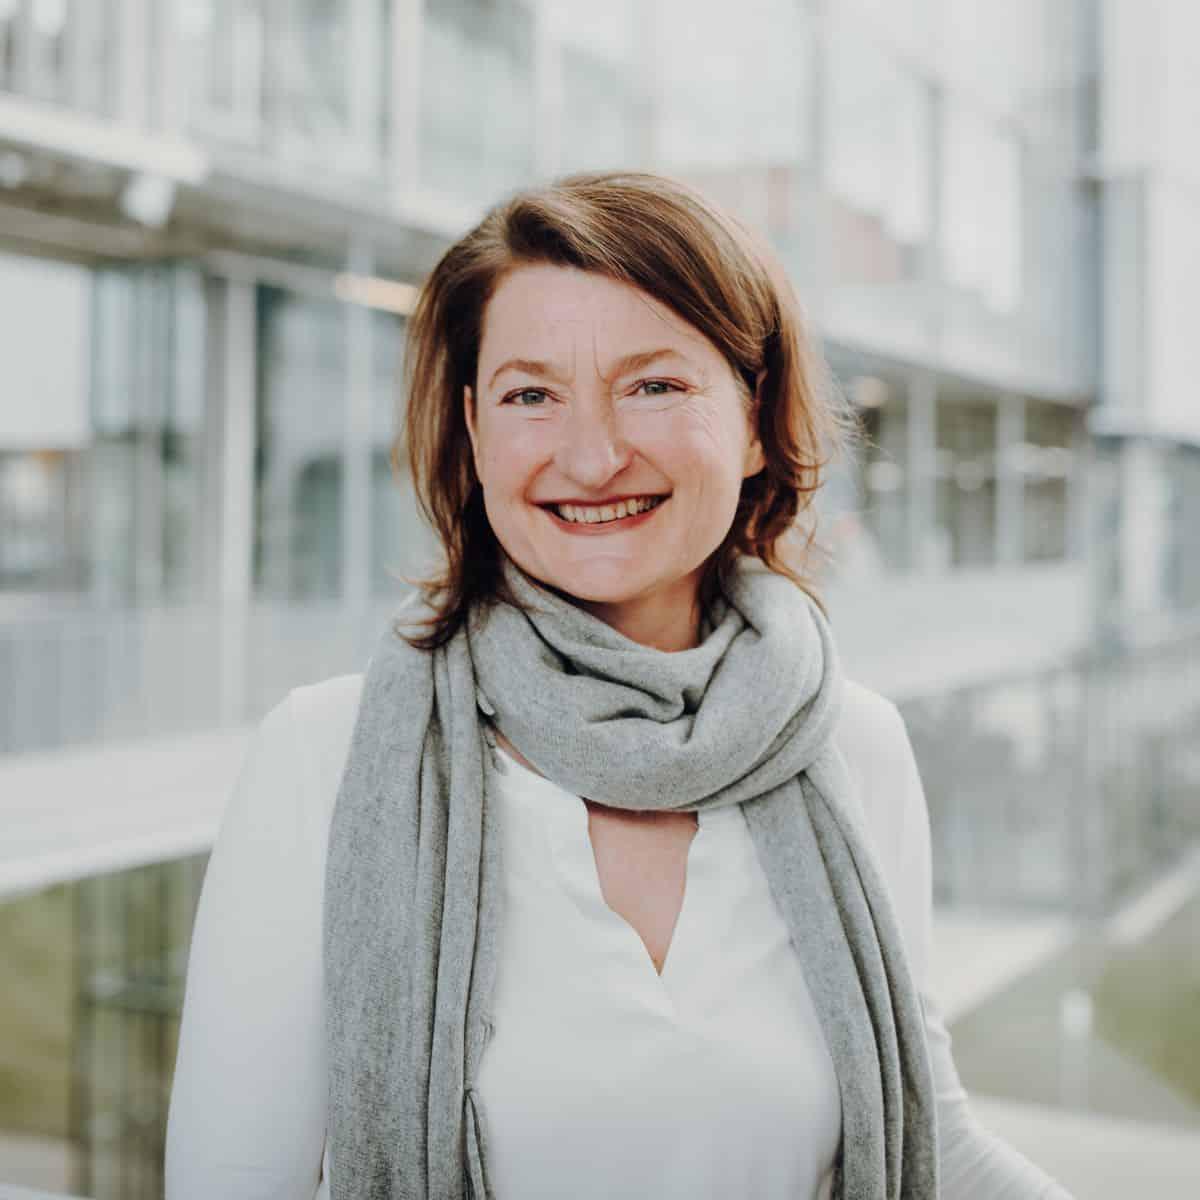 Birgit Feldhusen - Freiräume 2021 - Foto Walter Skokanitsch